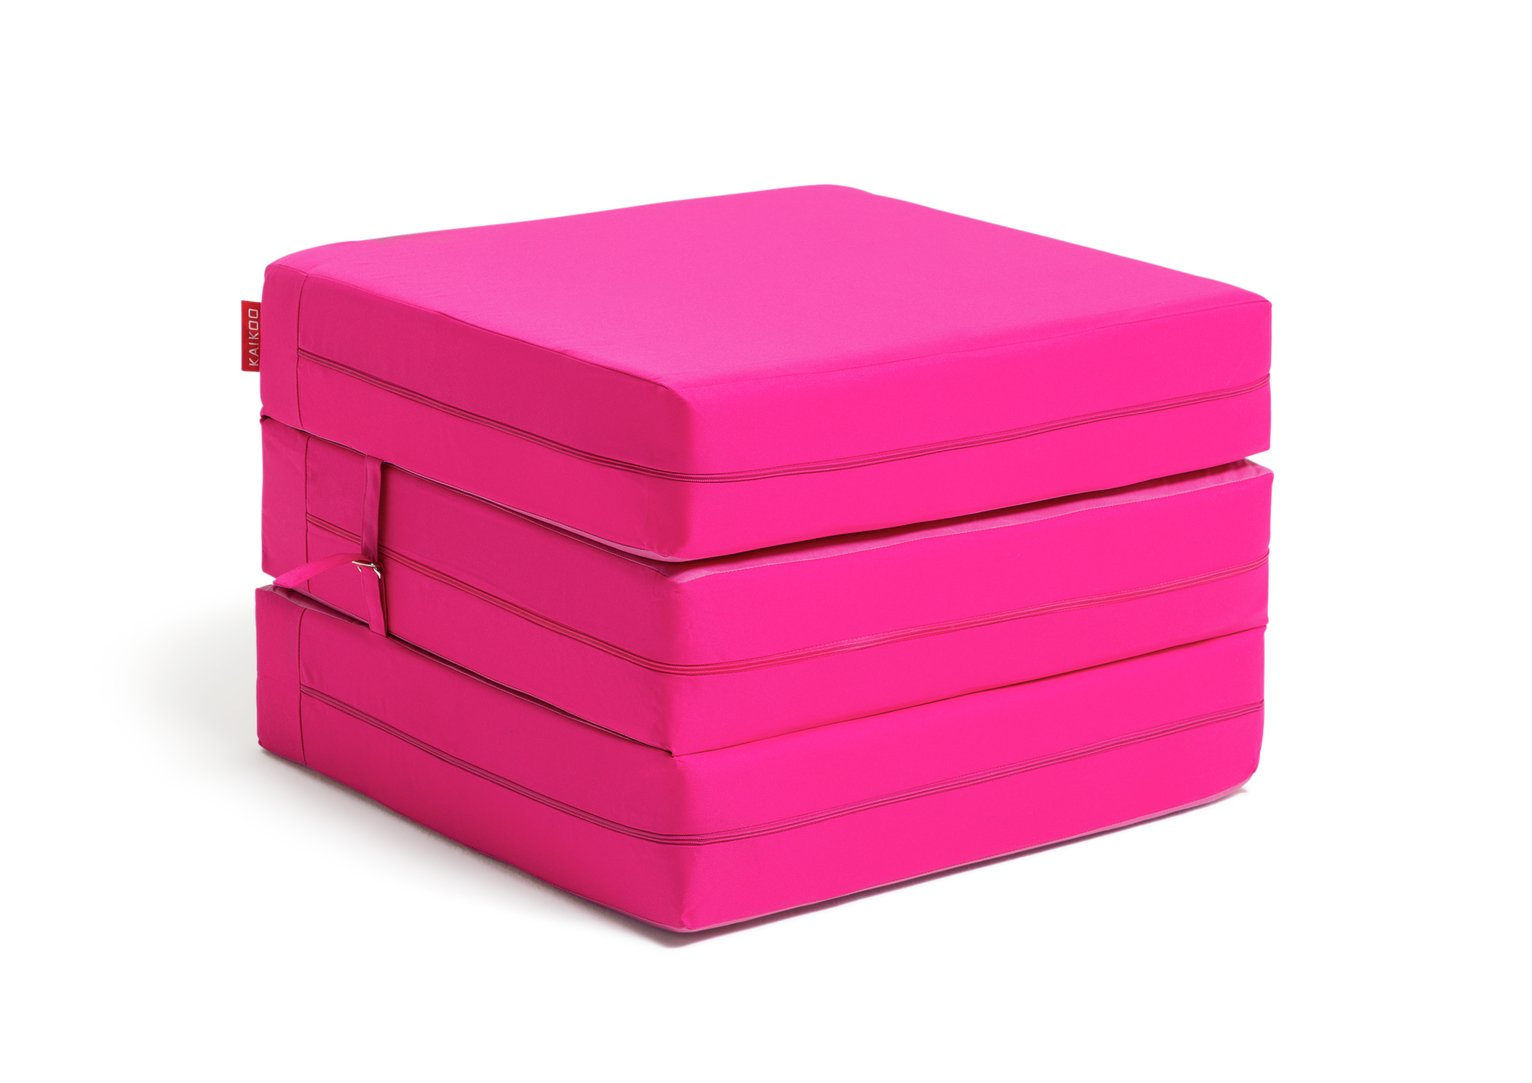 Habitat Single Mattress Cube - Funky Fuchsia